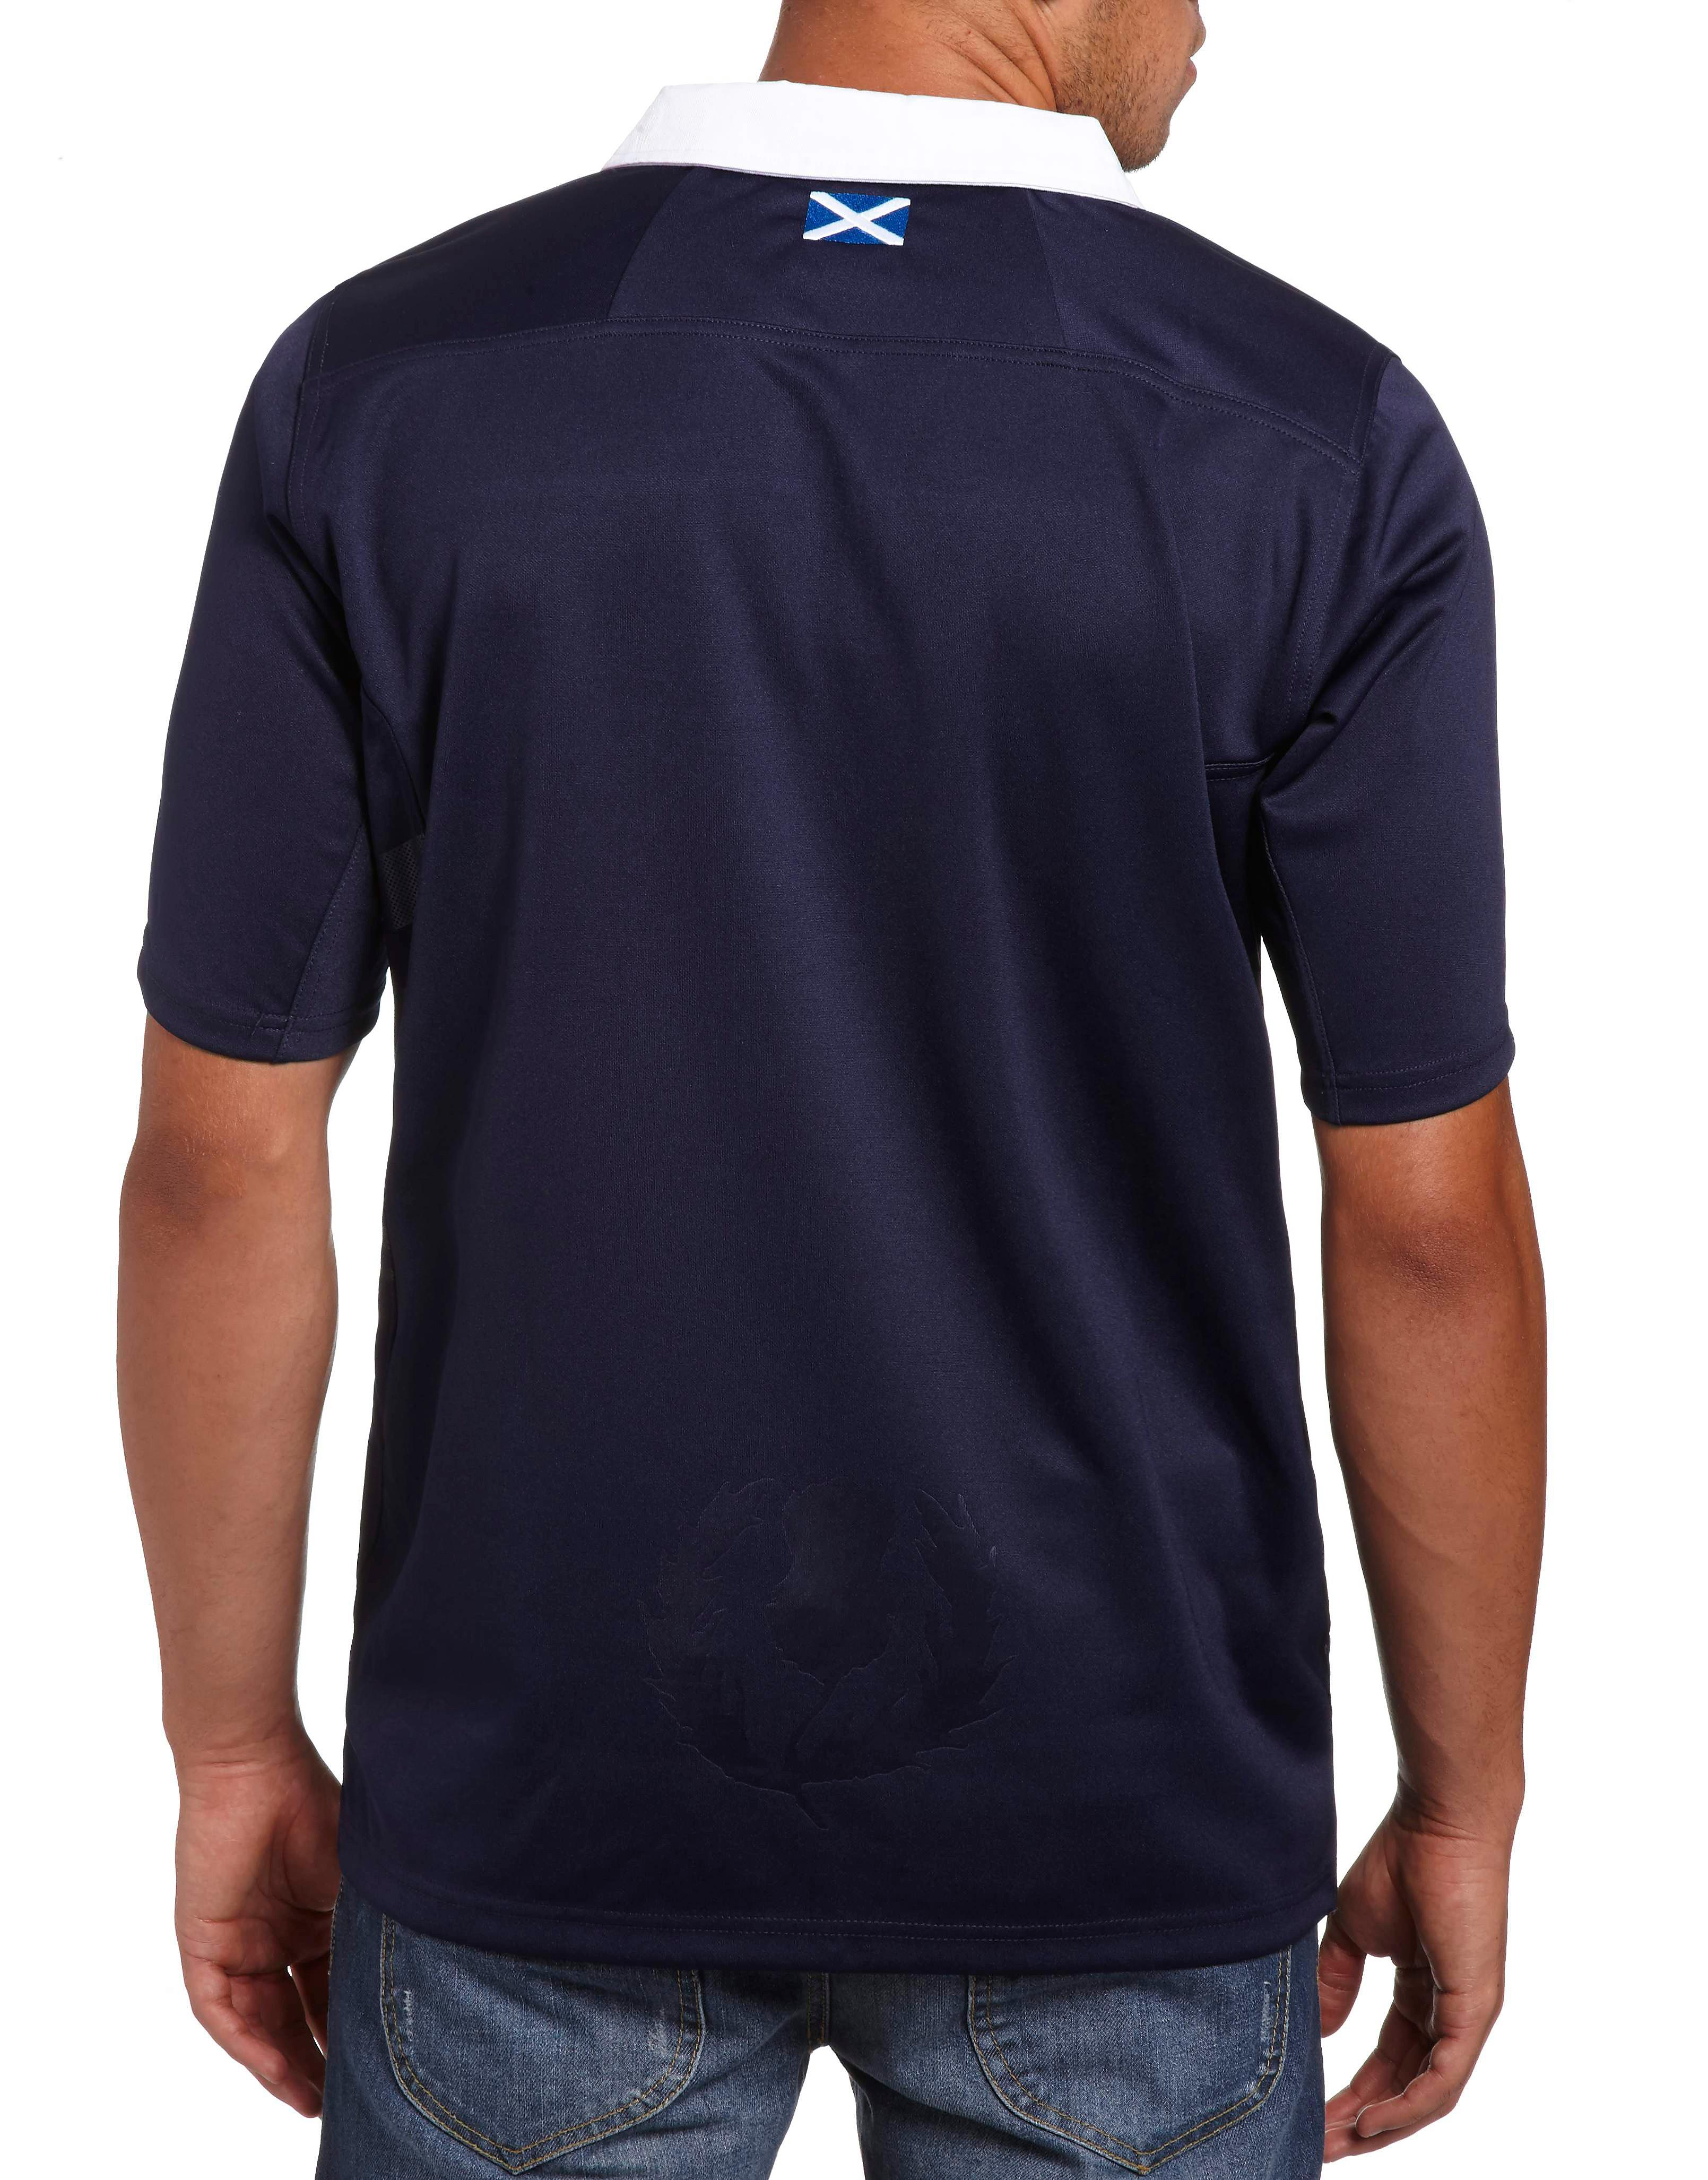 Macron Scotland Rugby Union 2013/14 Home Shirt